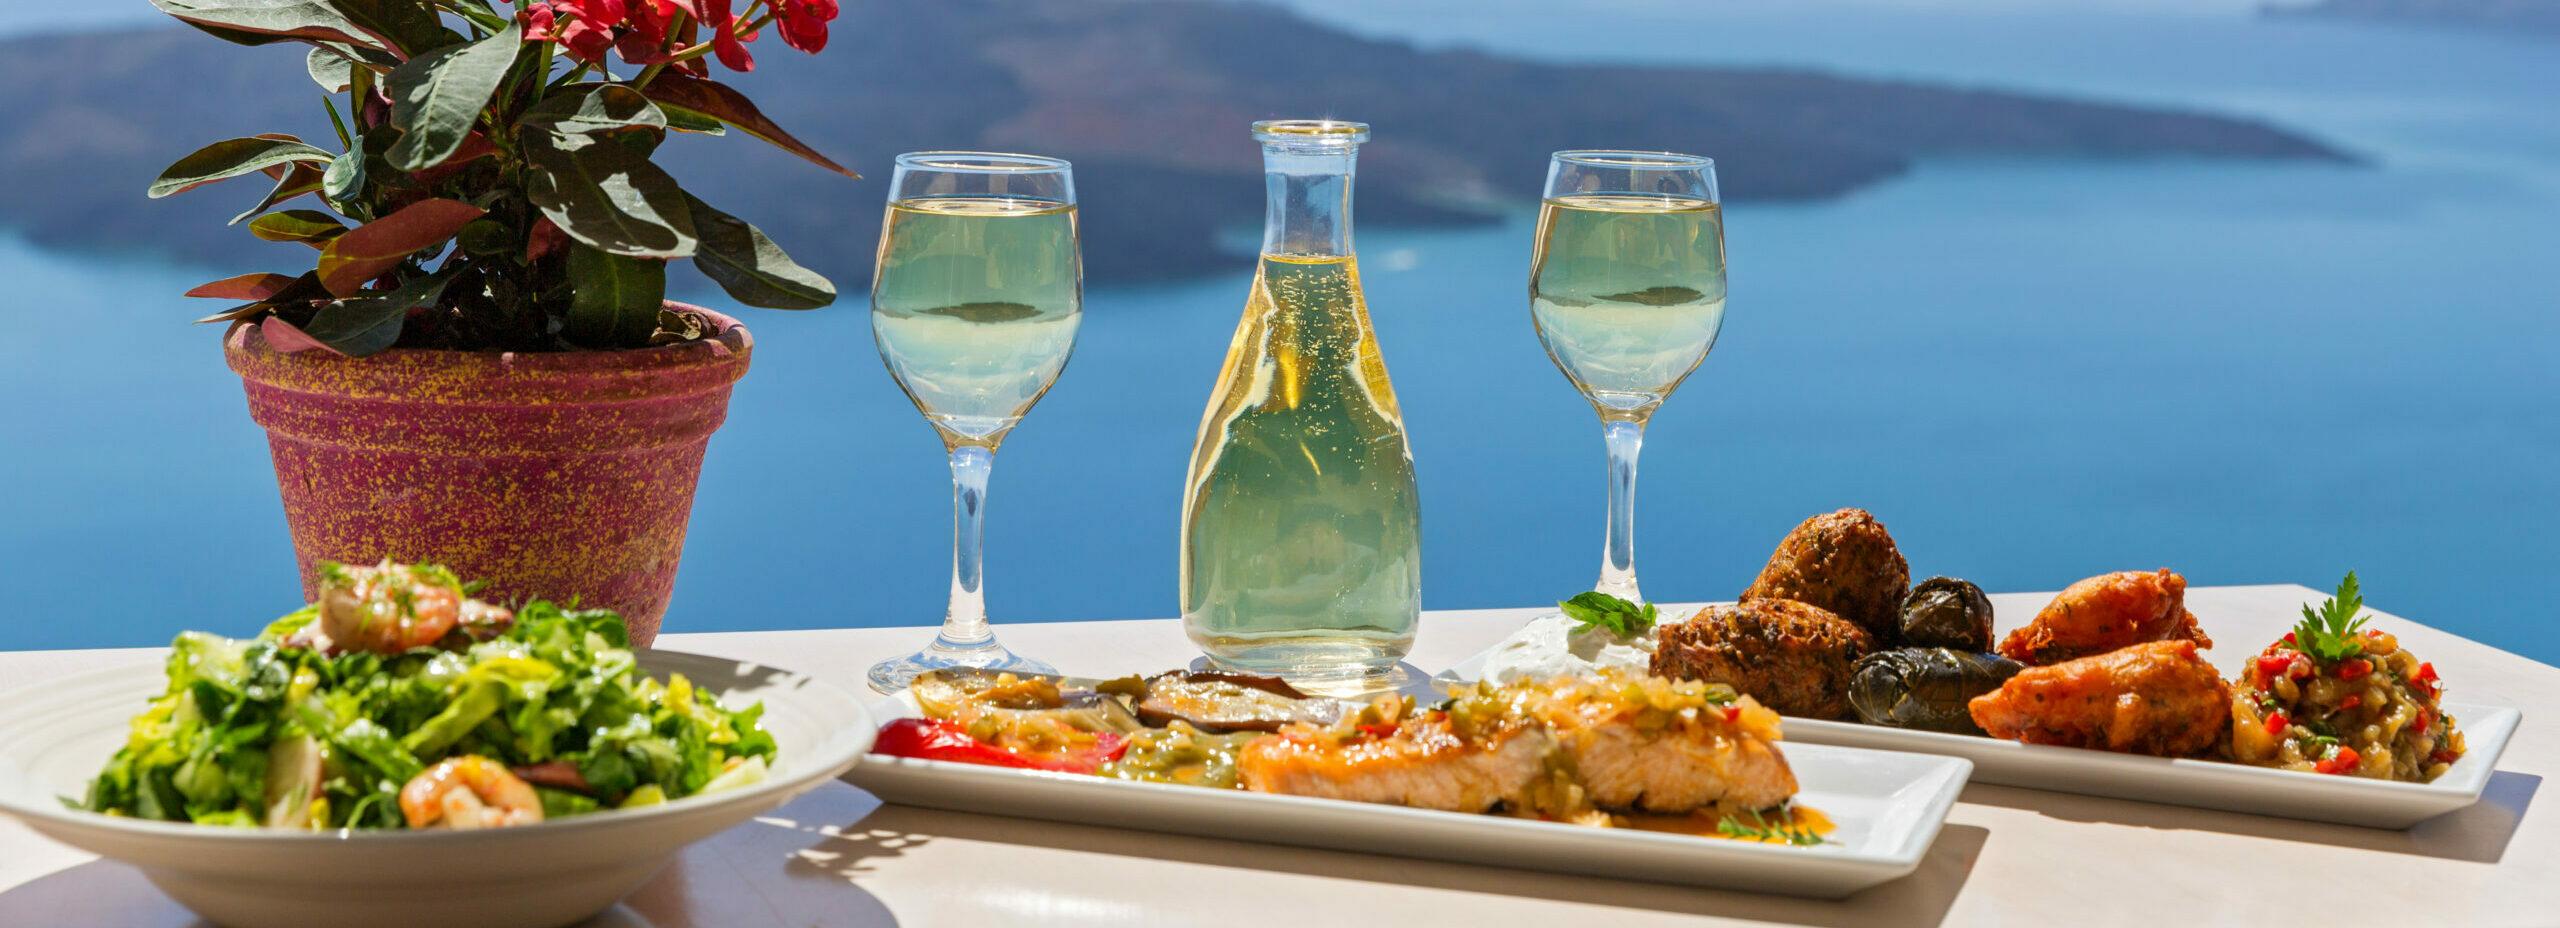 Gastronomic trip to Santorini with tomato meatballs and boussés